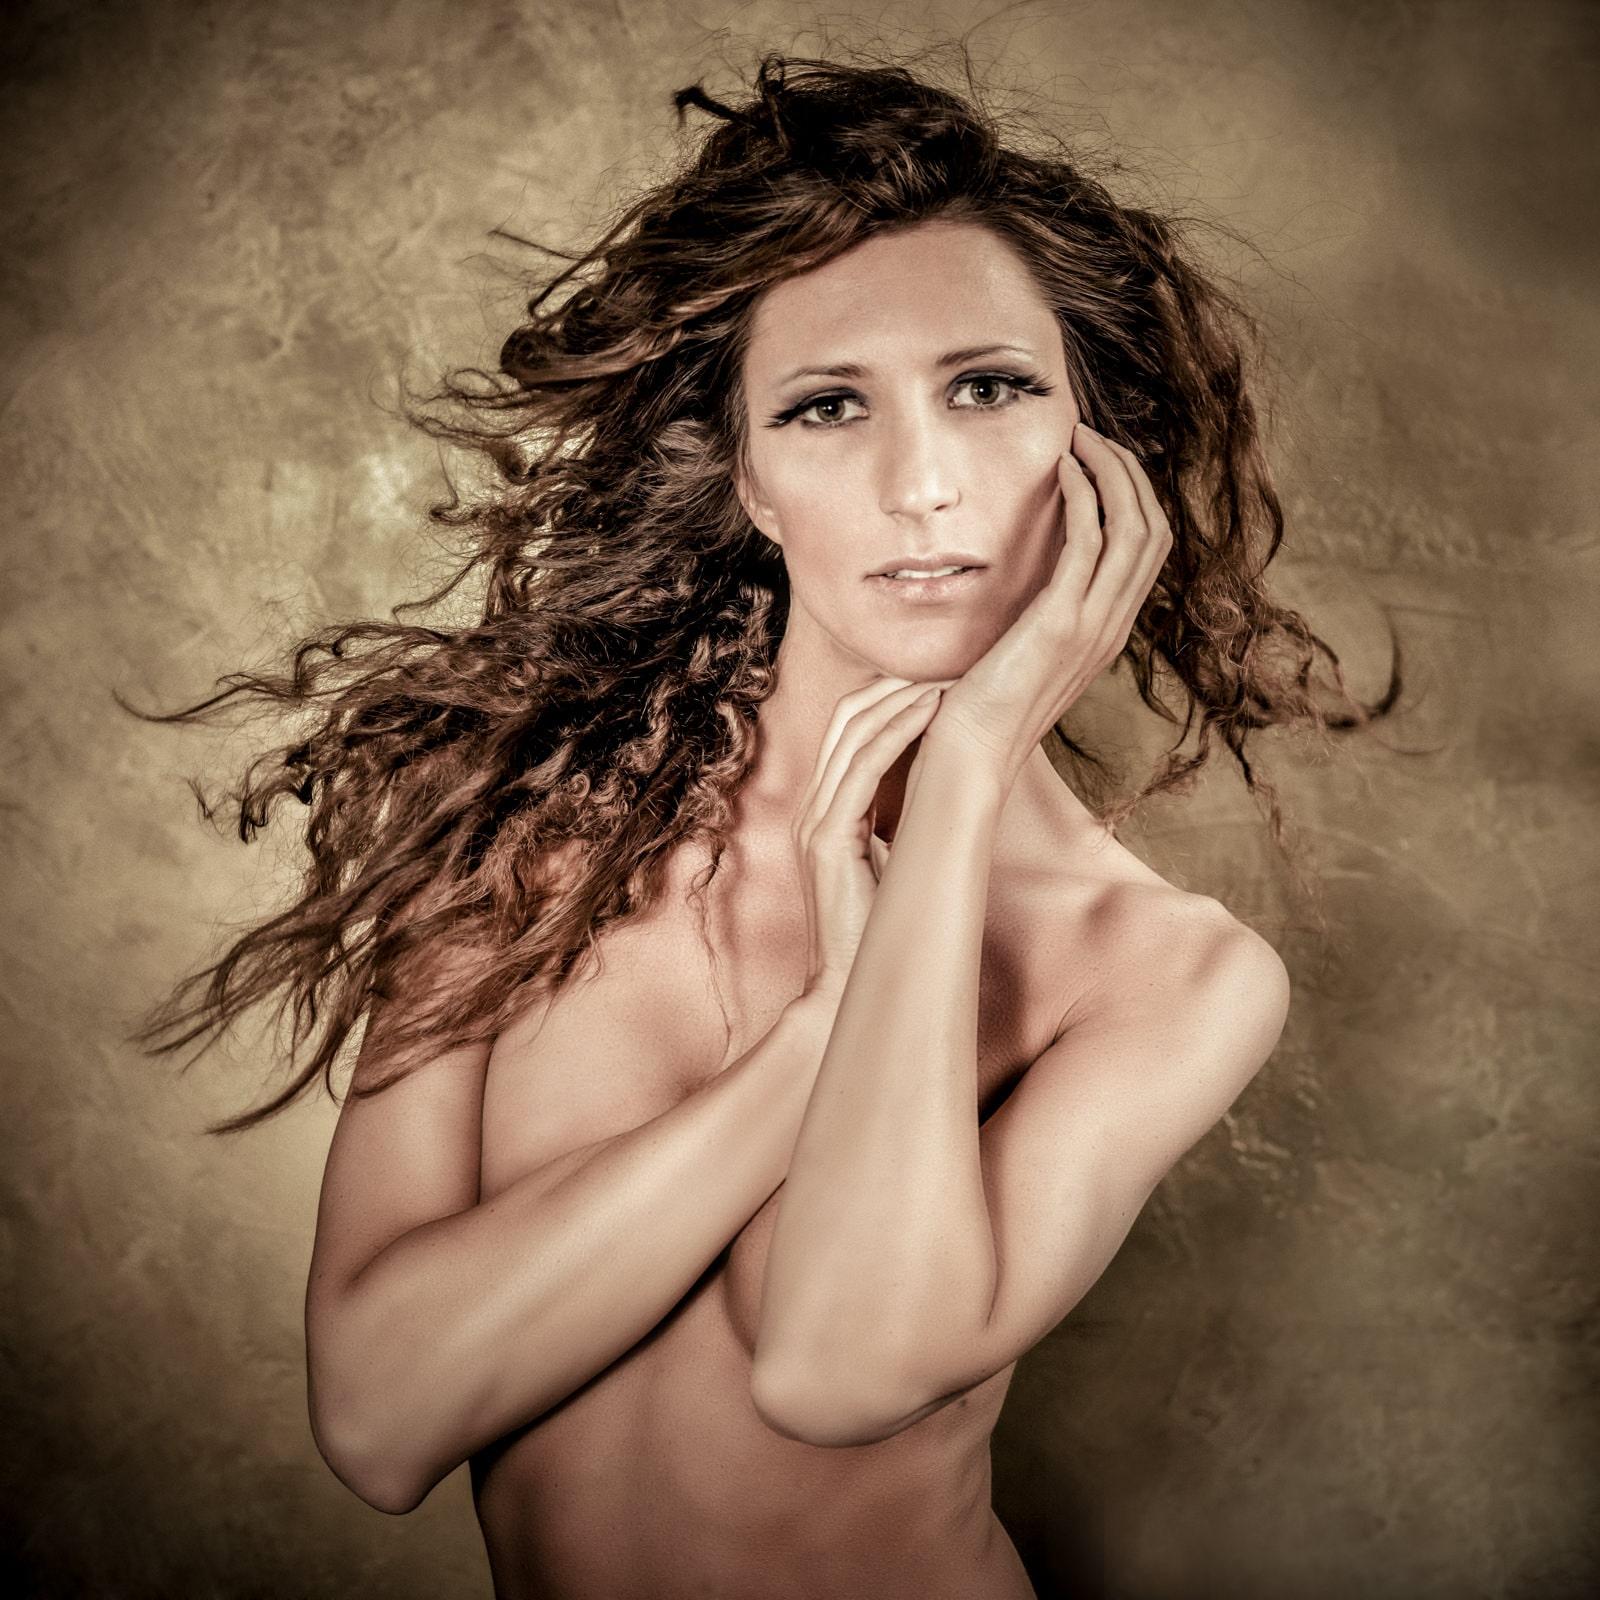 Witzgall Fotografie - Portraits